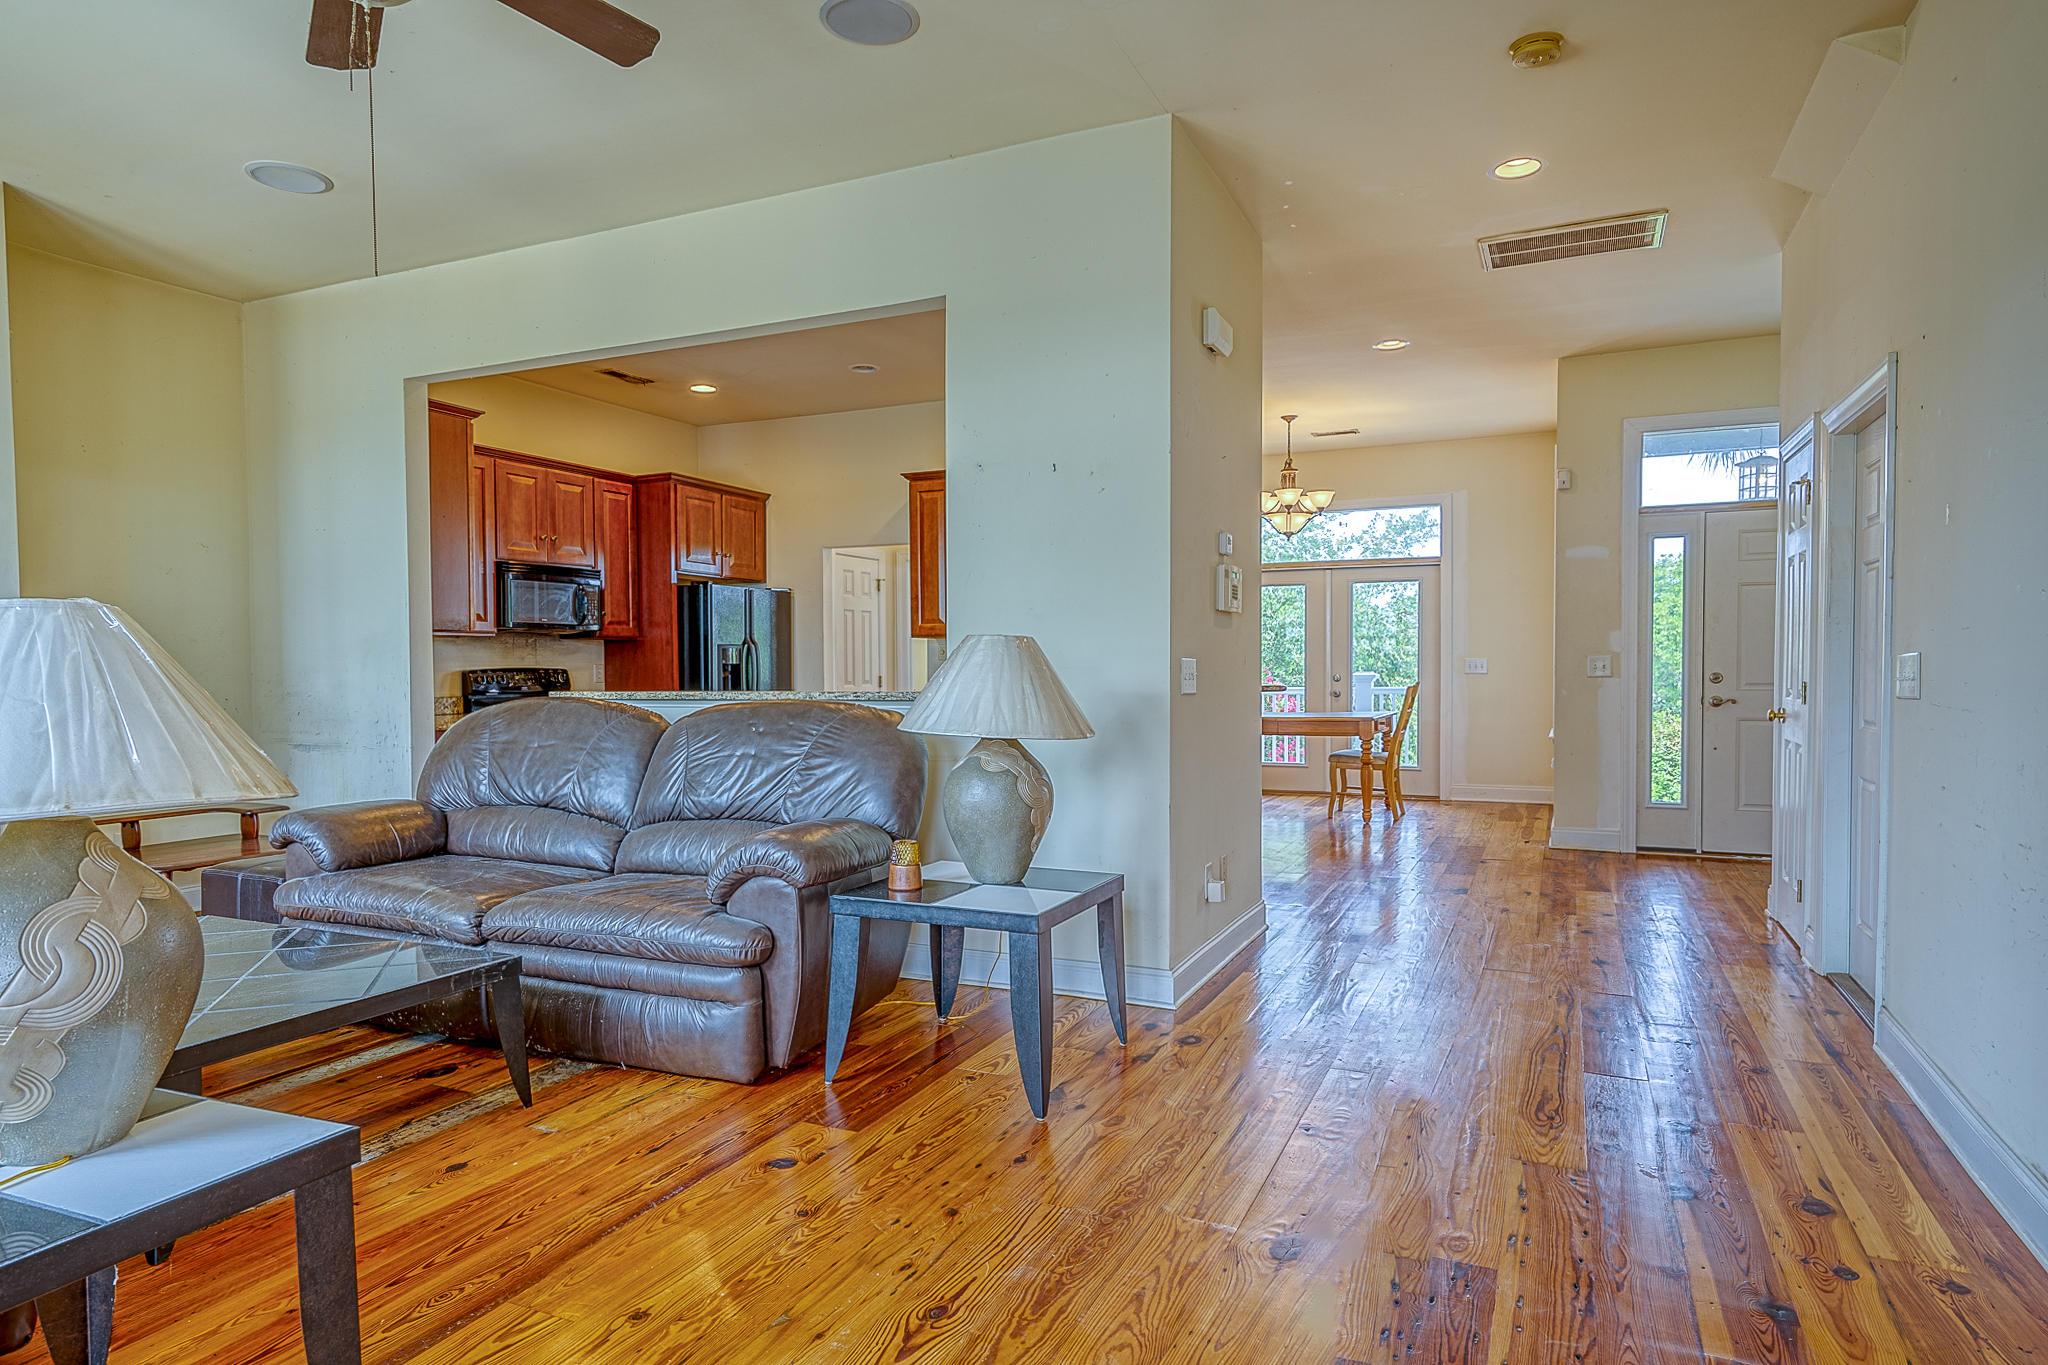 Folly Creek Place Homes For Sale - 2238 Folly Road, Folly Beach, SC - 18